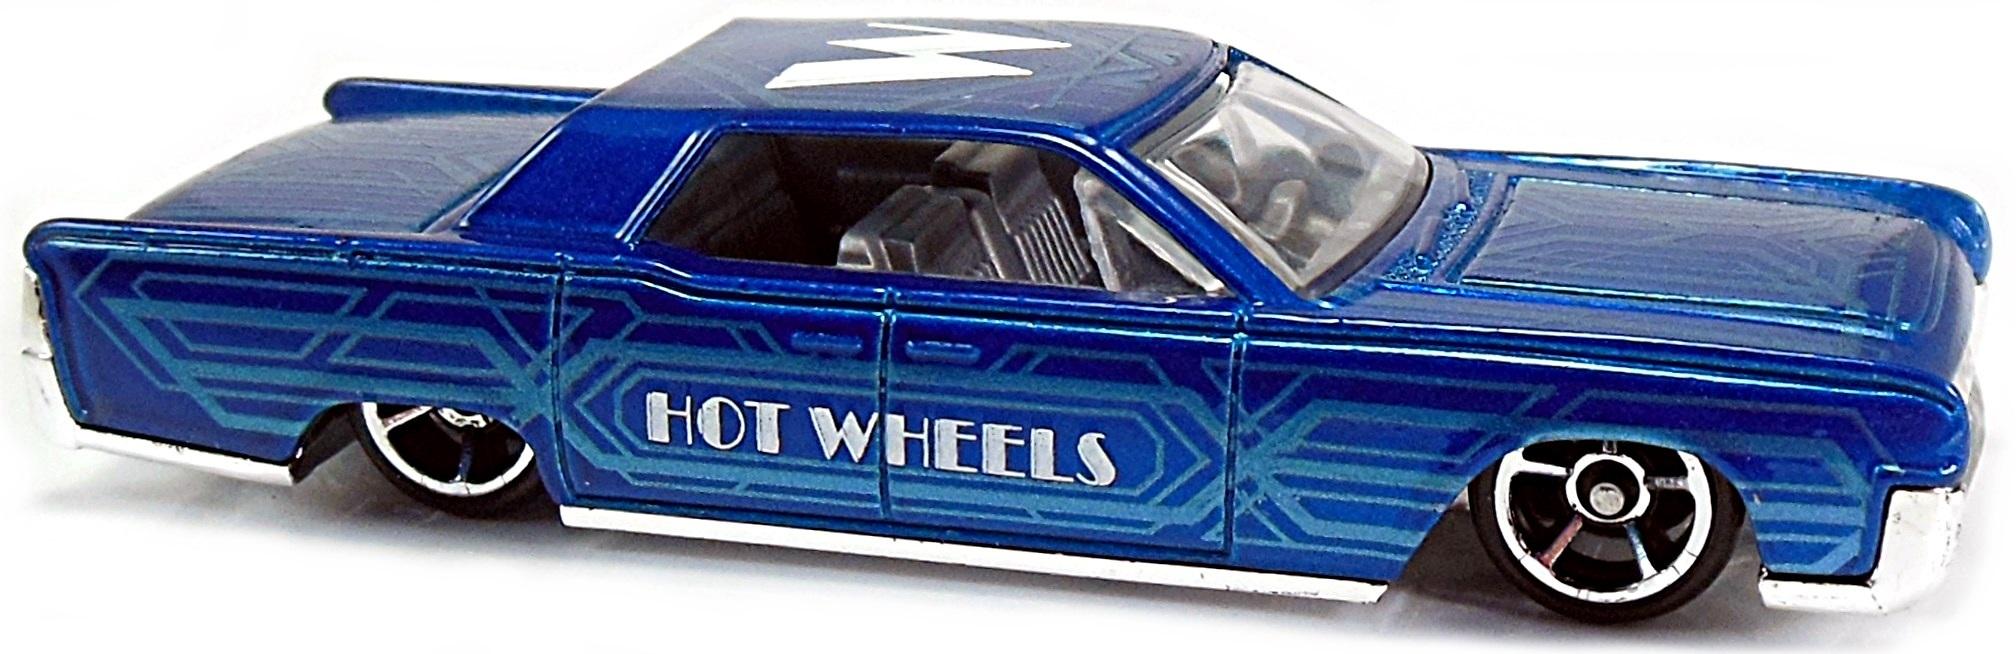 1964 lincoln continental 82mm 2007 hot wheels newsletter. Black Bedroom Furniture Sets. Home Design Ideas